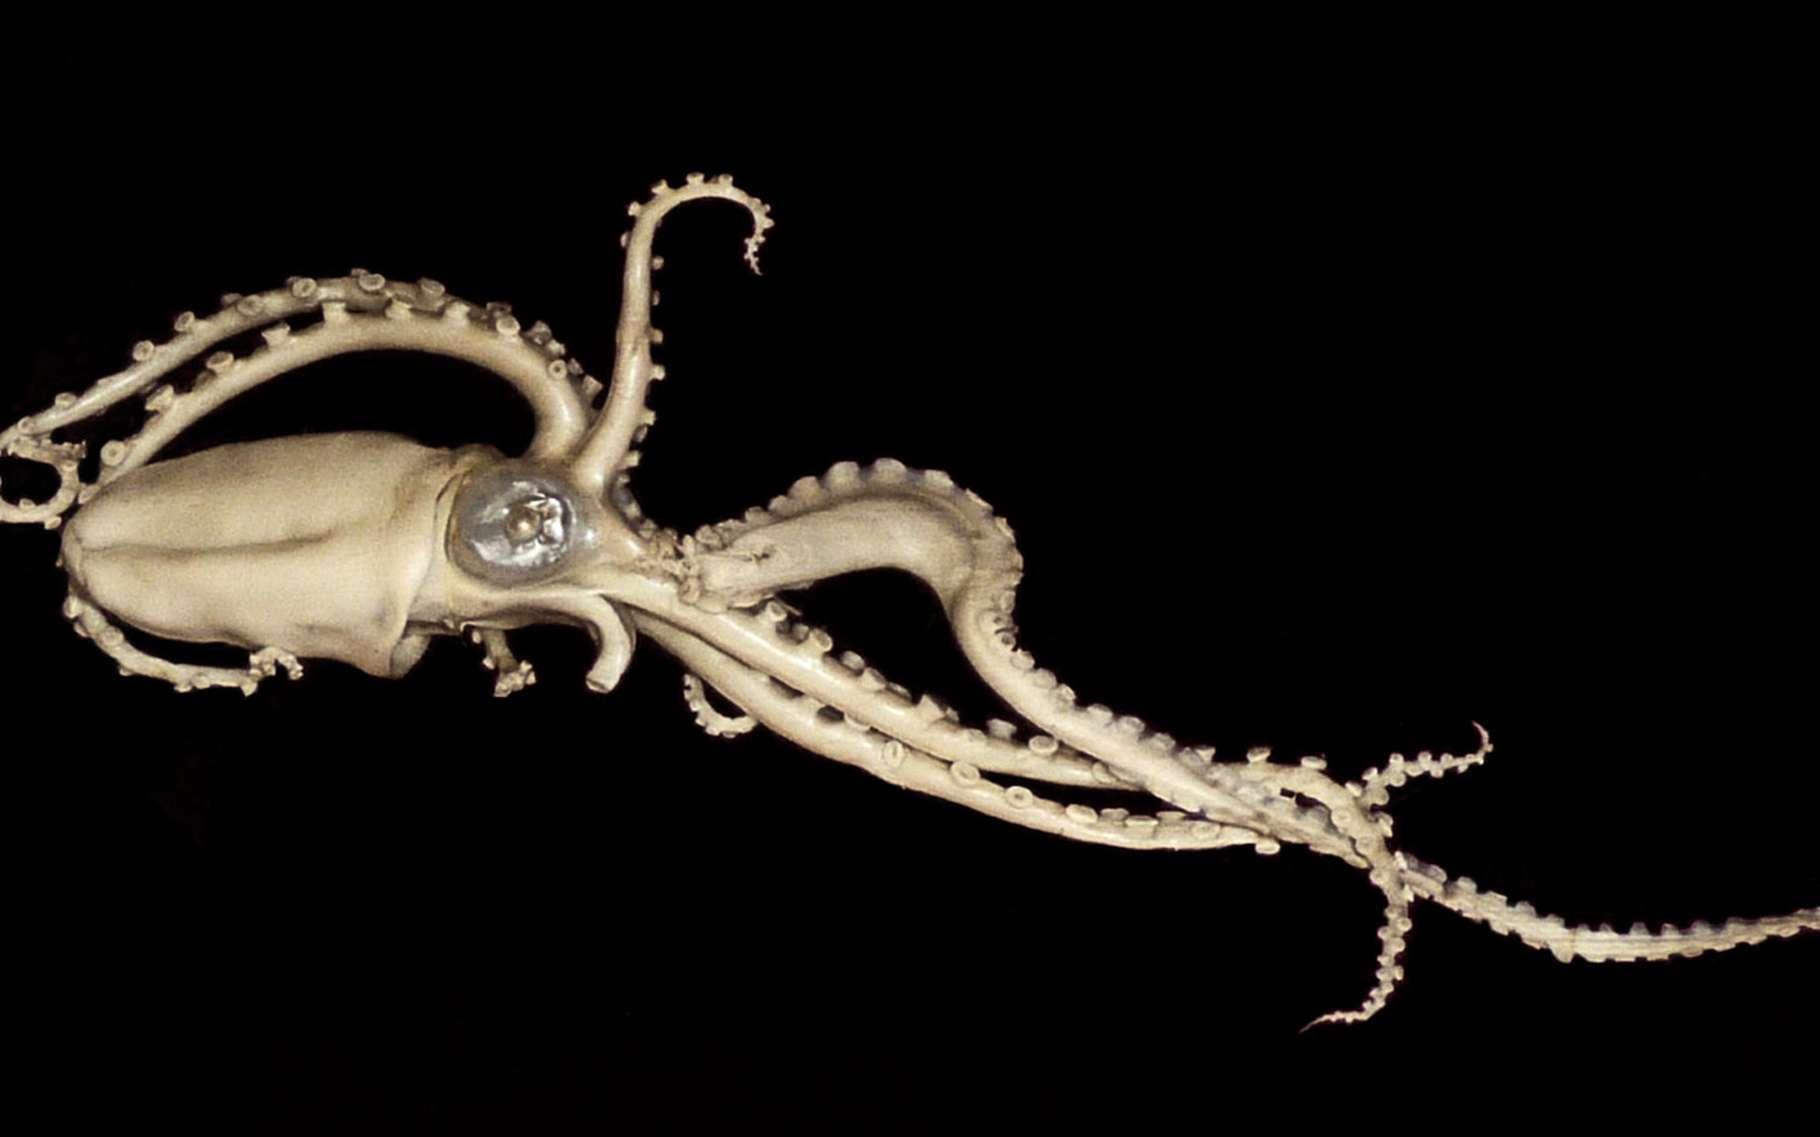 Ocythoe tuberculata. © Citron, Wikimedia commons, CC by-sa 3.0